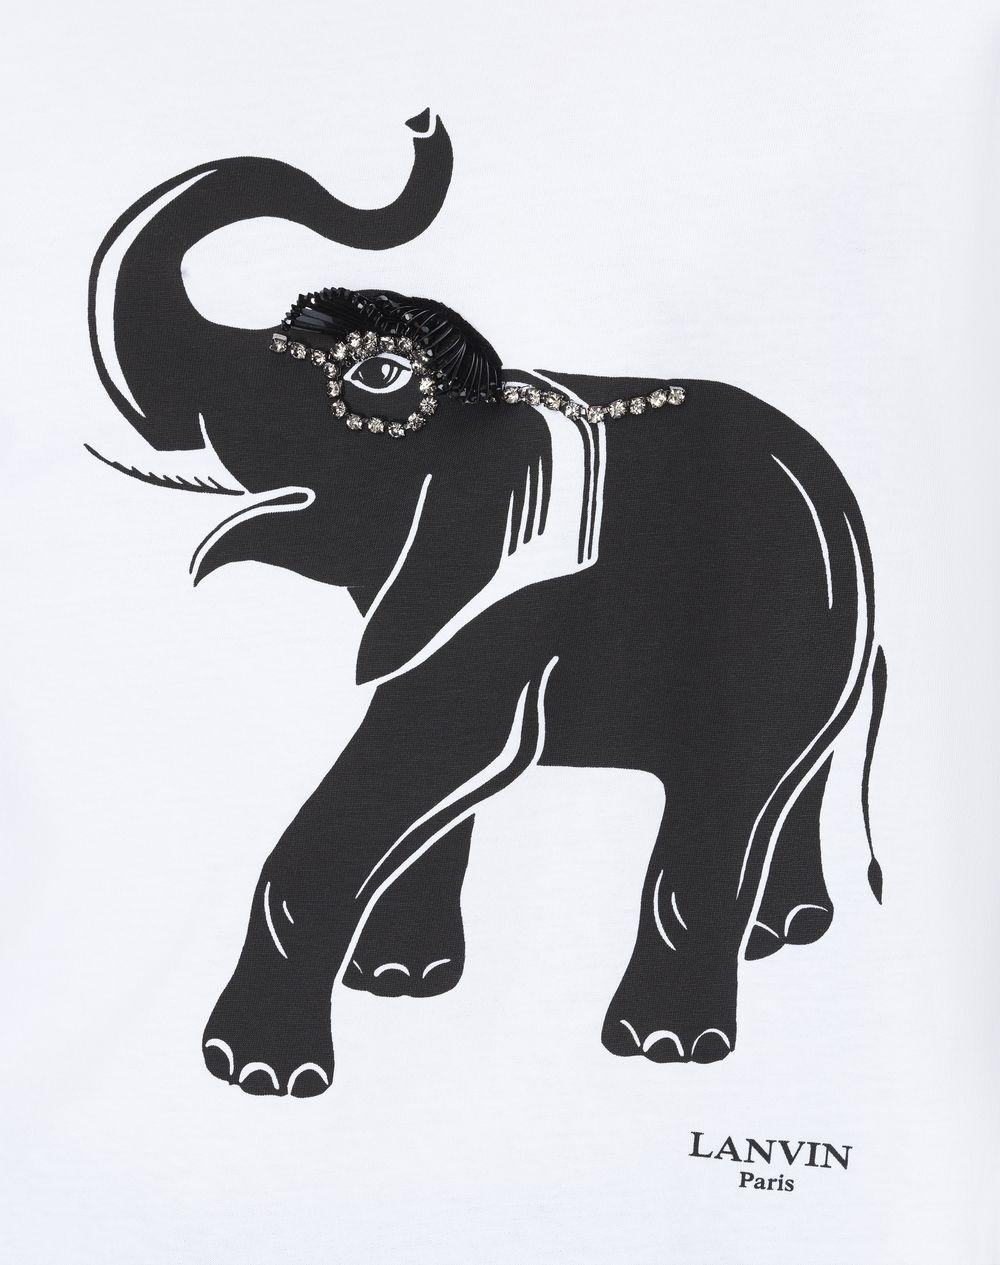 ELEPHANT PRINT JERSEY T-SHIRT  - Lanvin